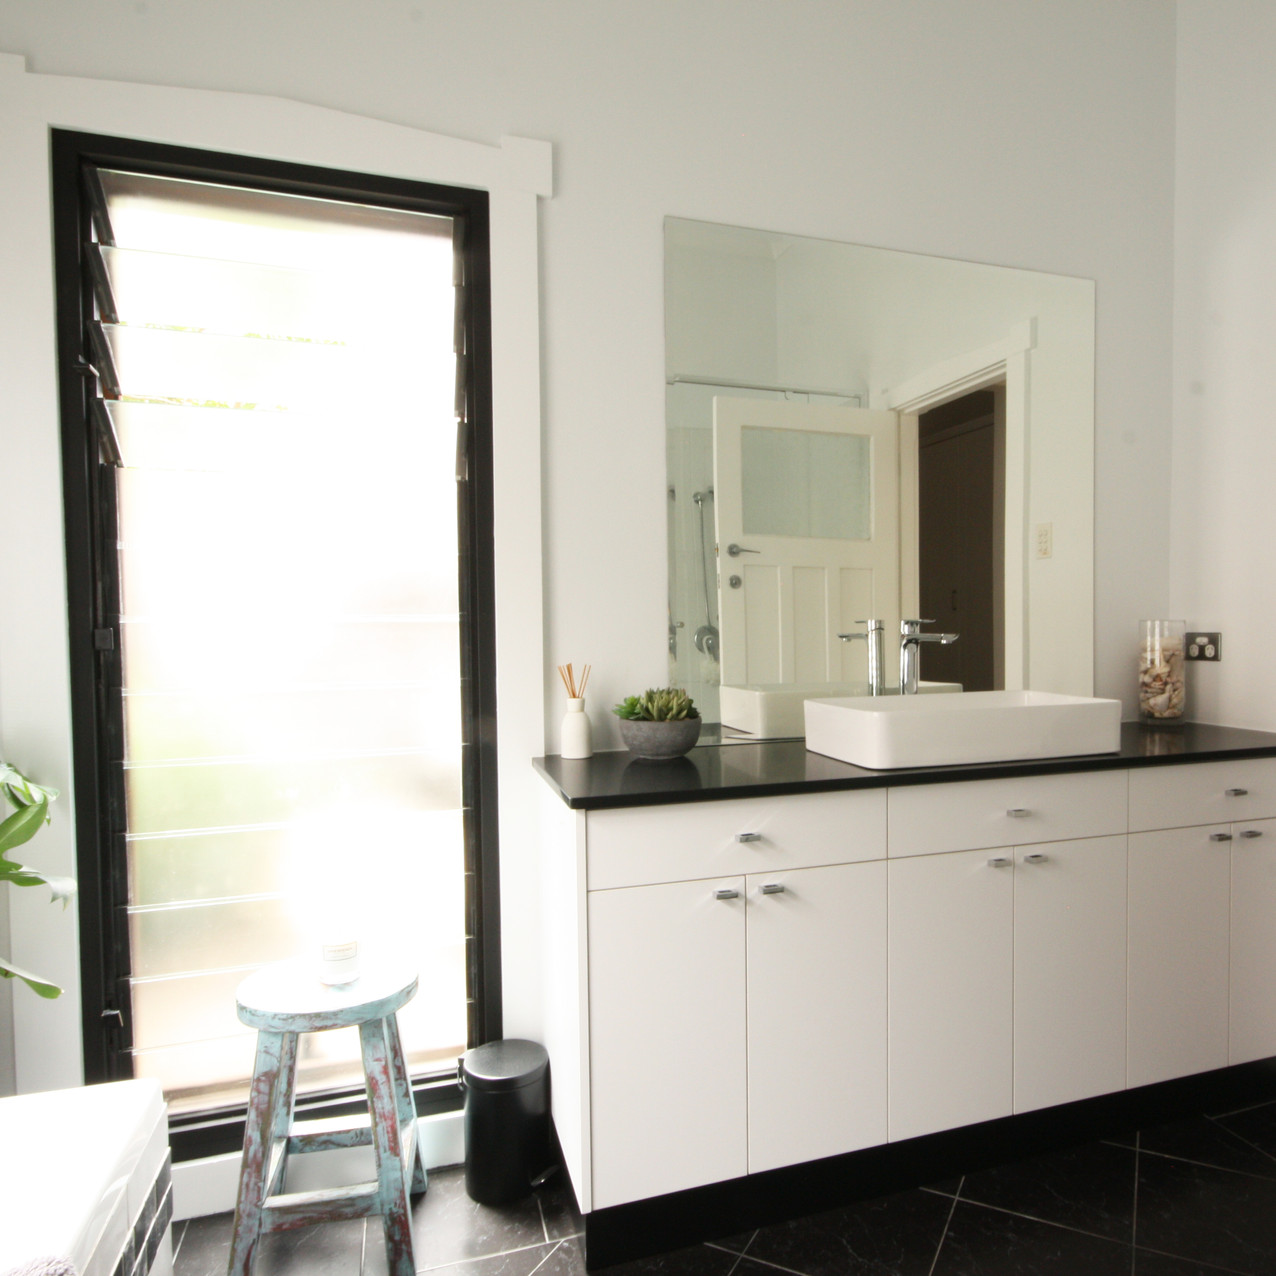 Transitional Bathroom Vanity Mt. Hawthorn, Perth